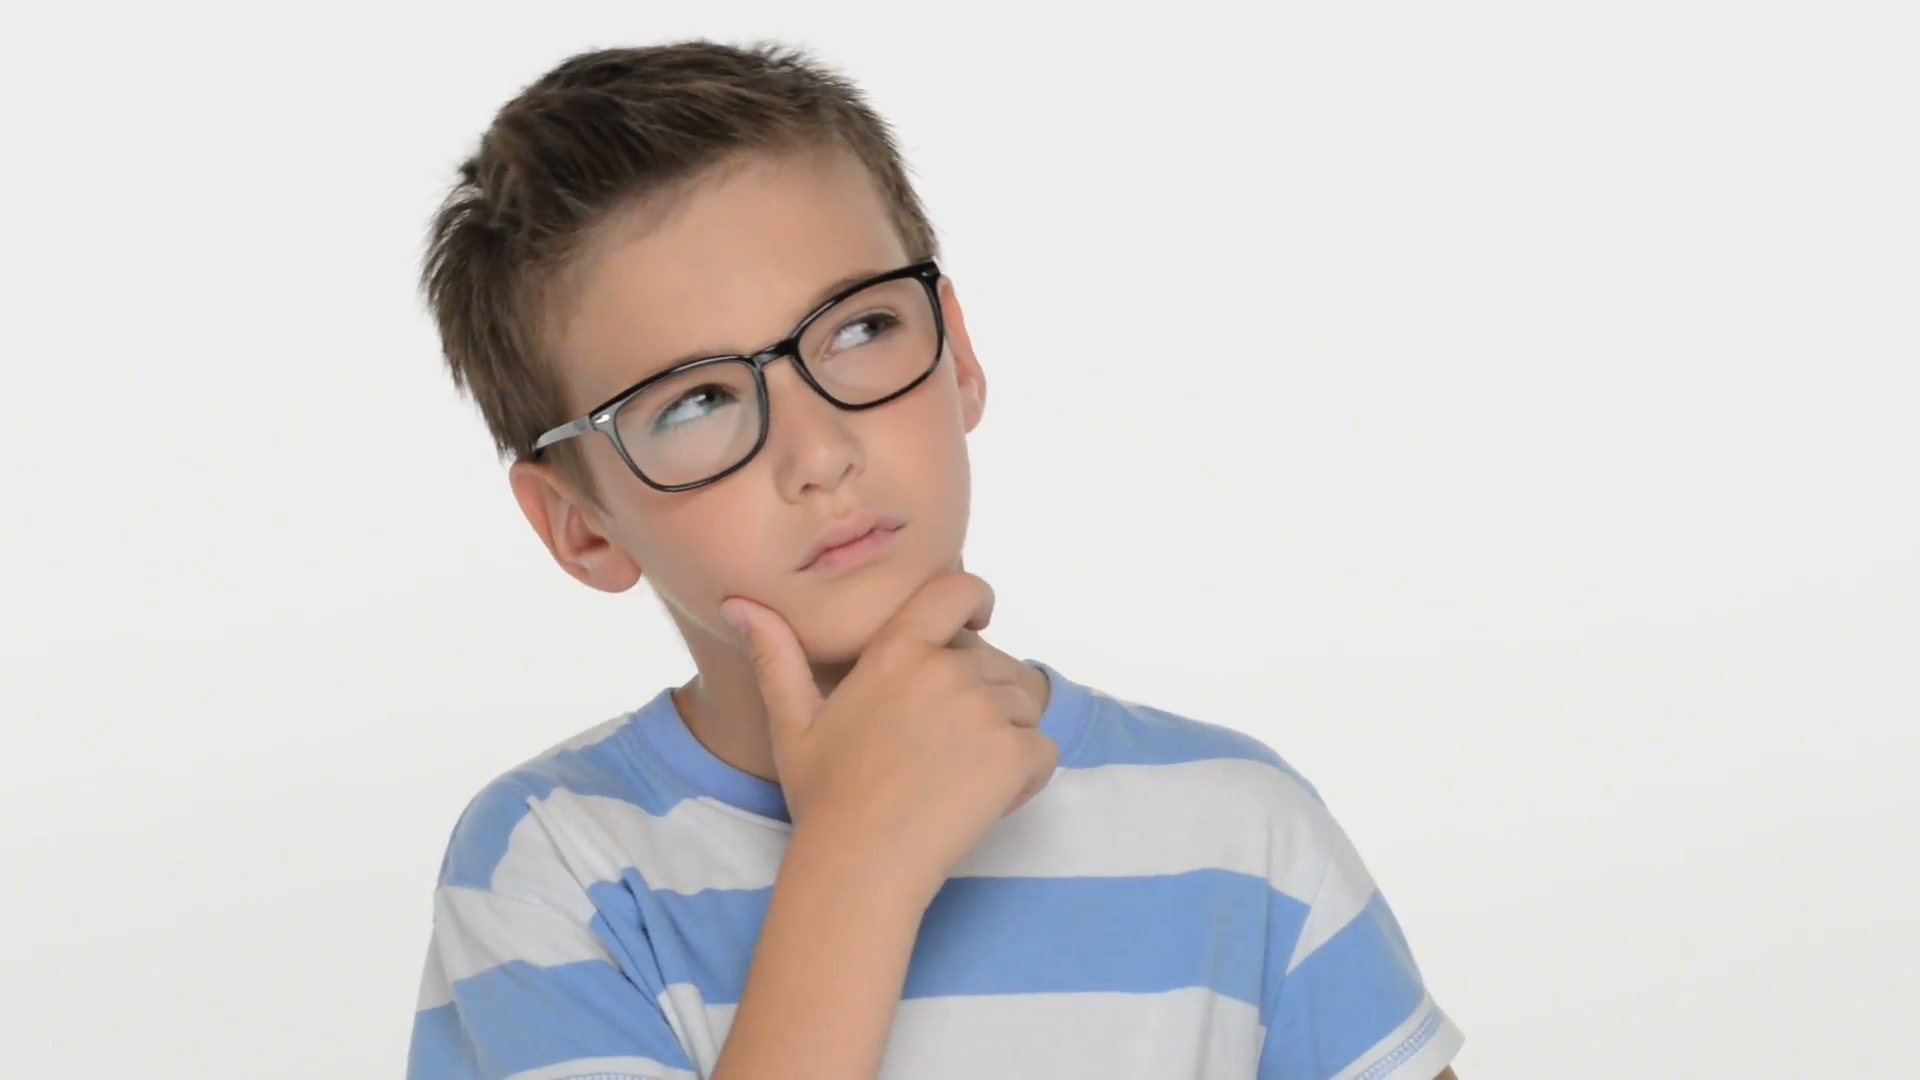 Boy Thinking PNG HD - 139176